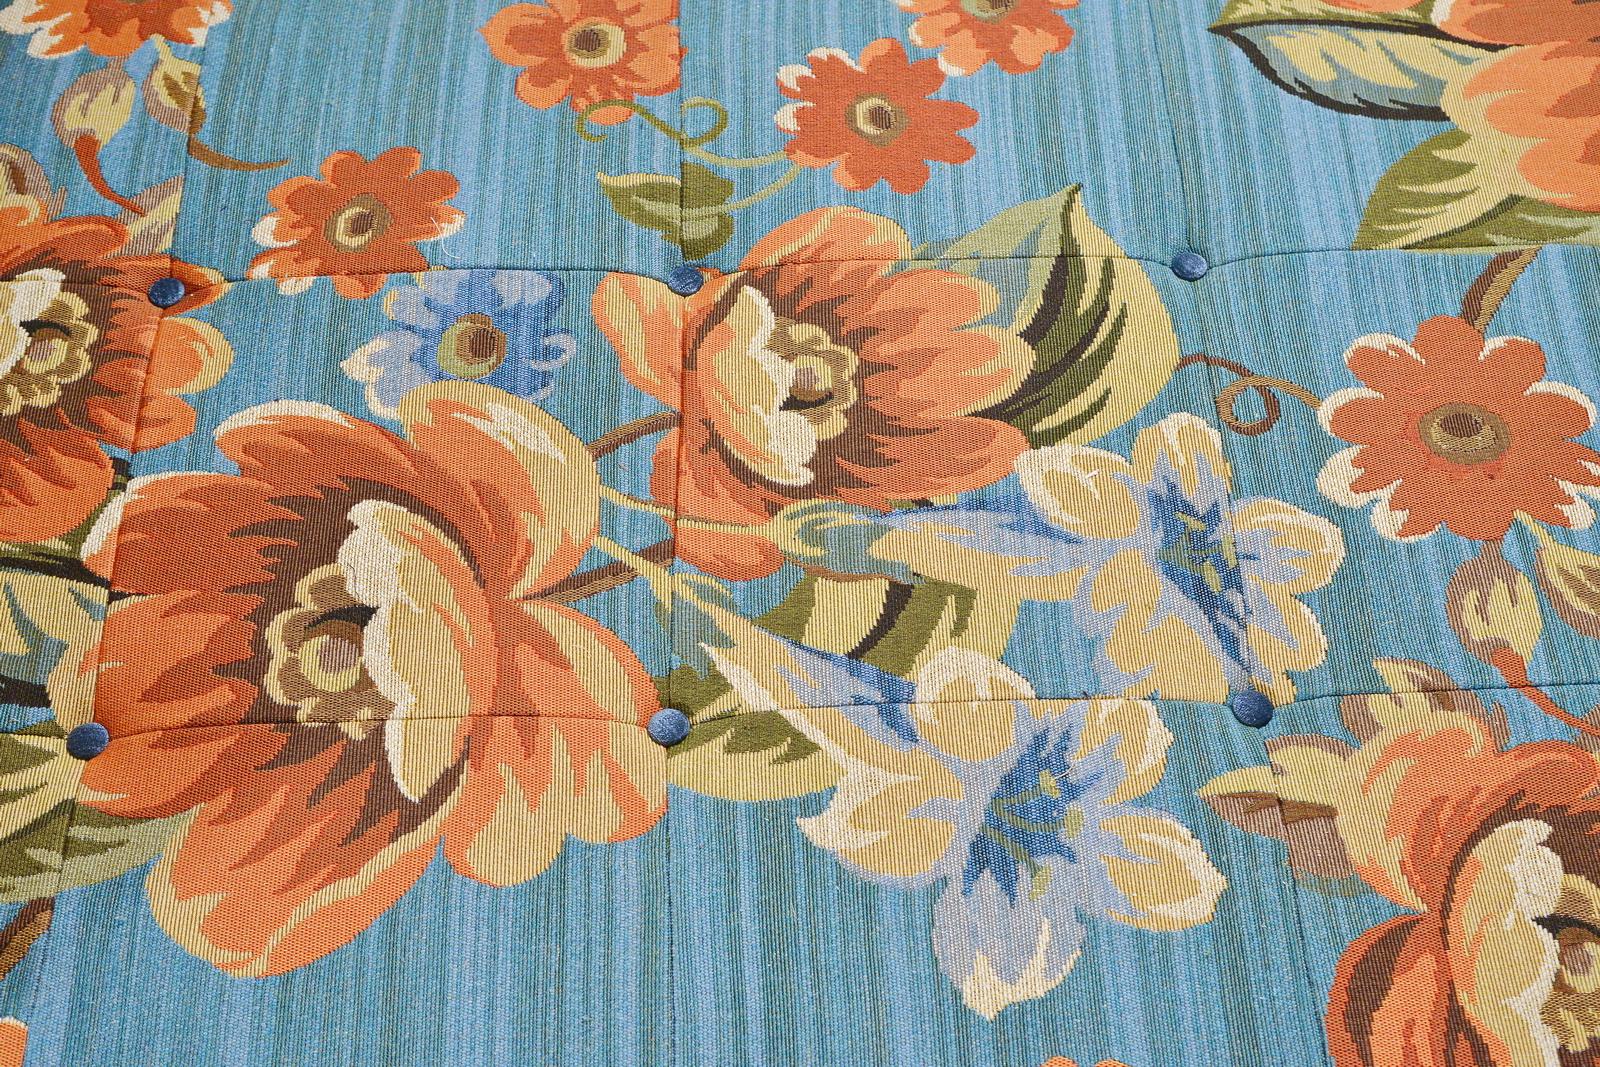 PTendercool-Sofa-PT76-BS1-TE-NO-JD&CO (Garden Tapestry)-190903-09